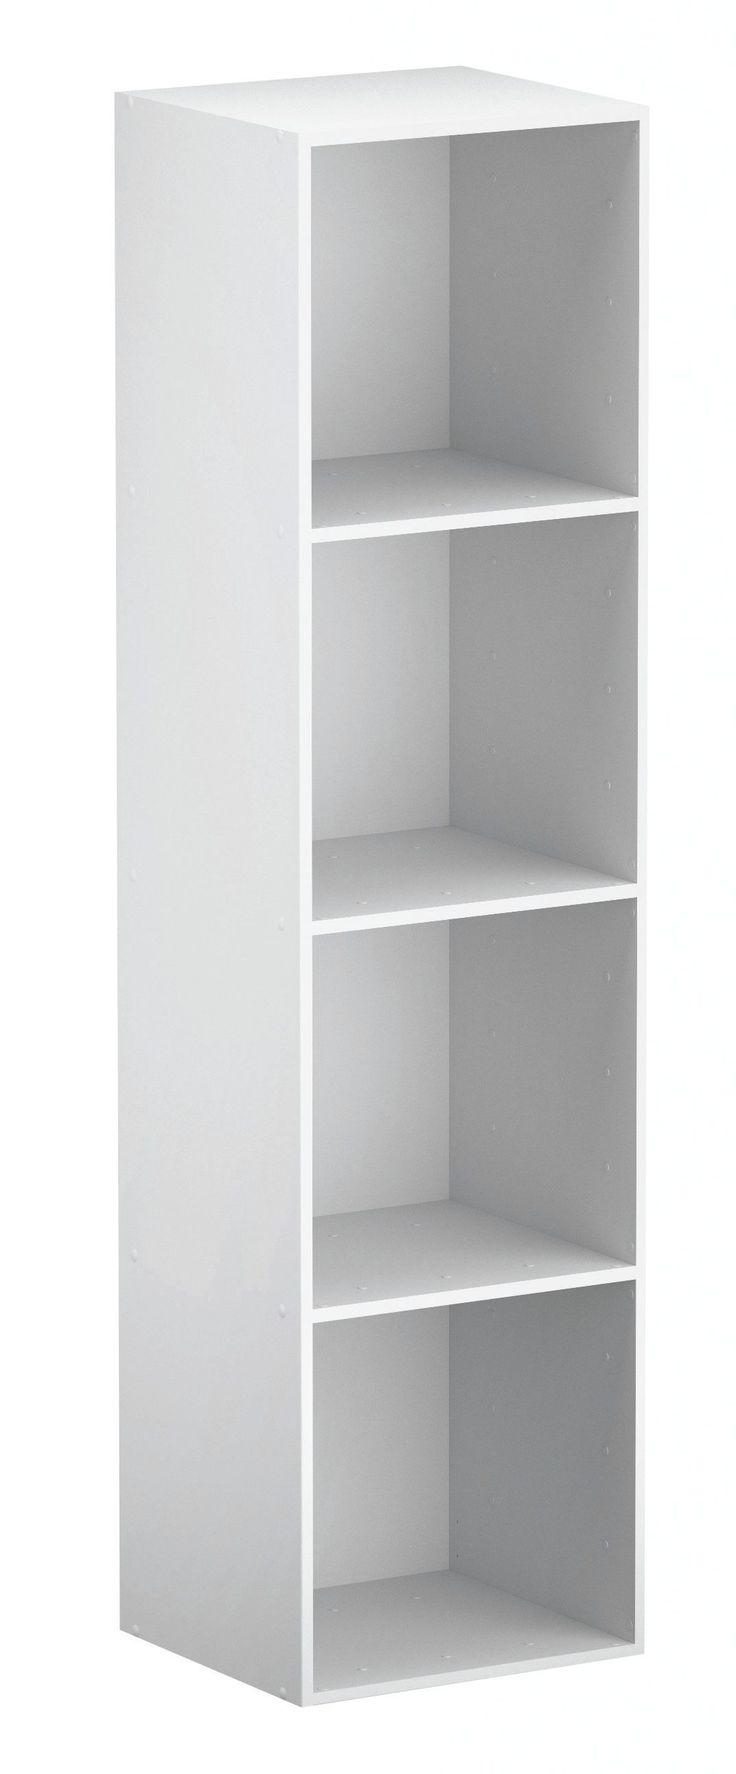 Form Konnect White 4 Cube Shelving Unit (H)1372mm (W)352mm | Departments | DIY at B&Q